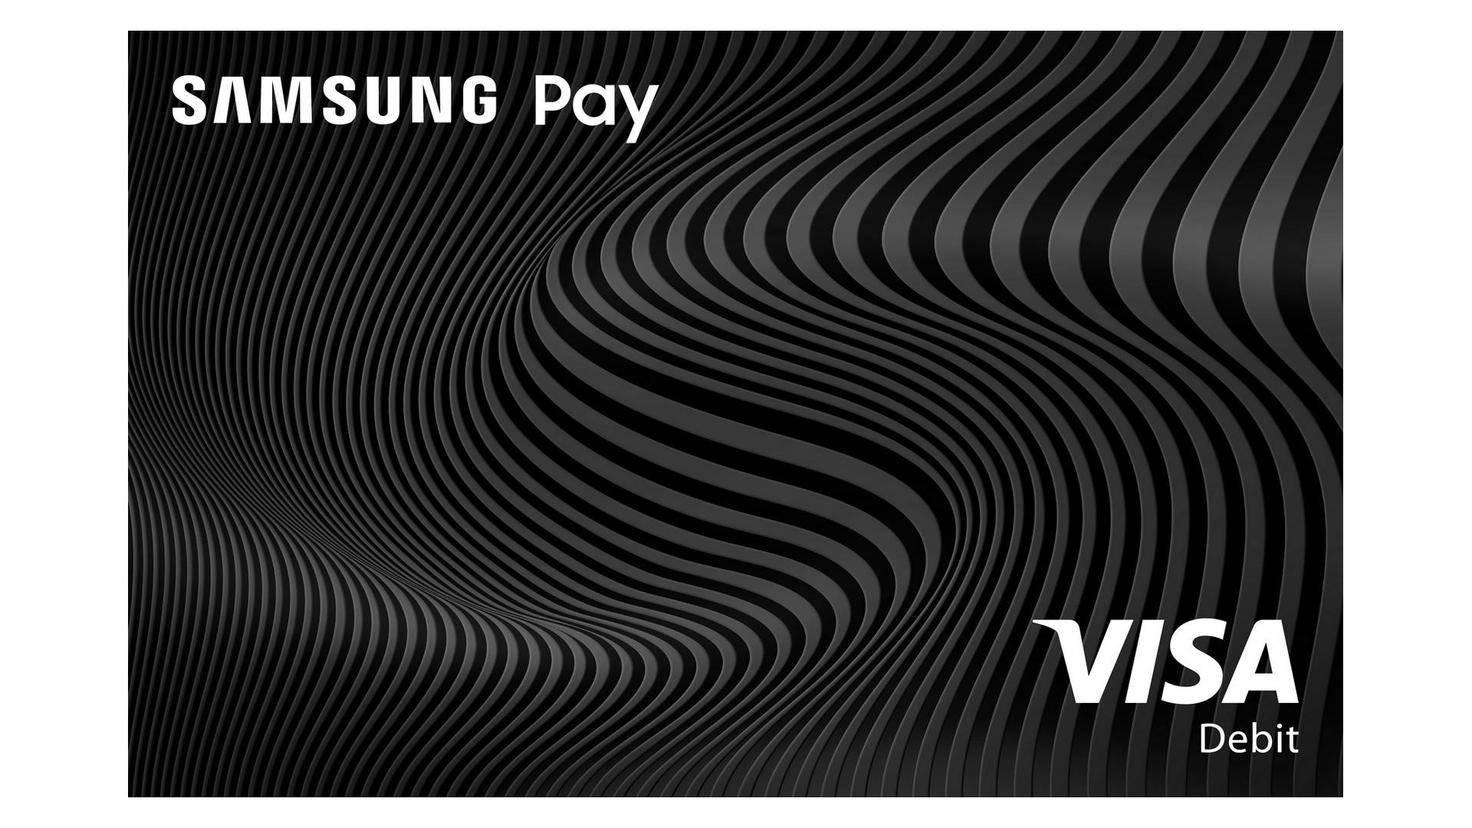 Samsung_Pay_Card_Visa_Debit_grau_RGB